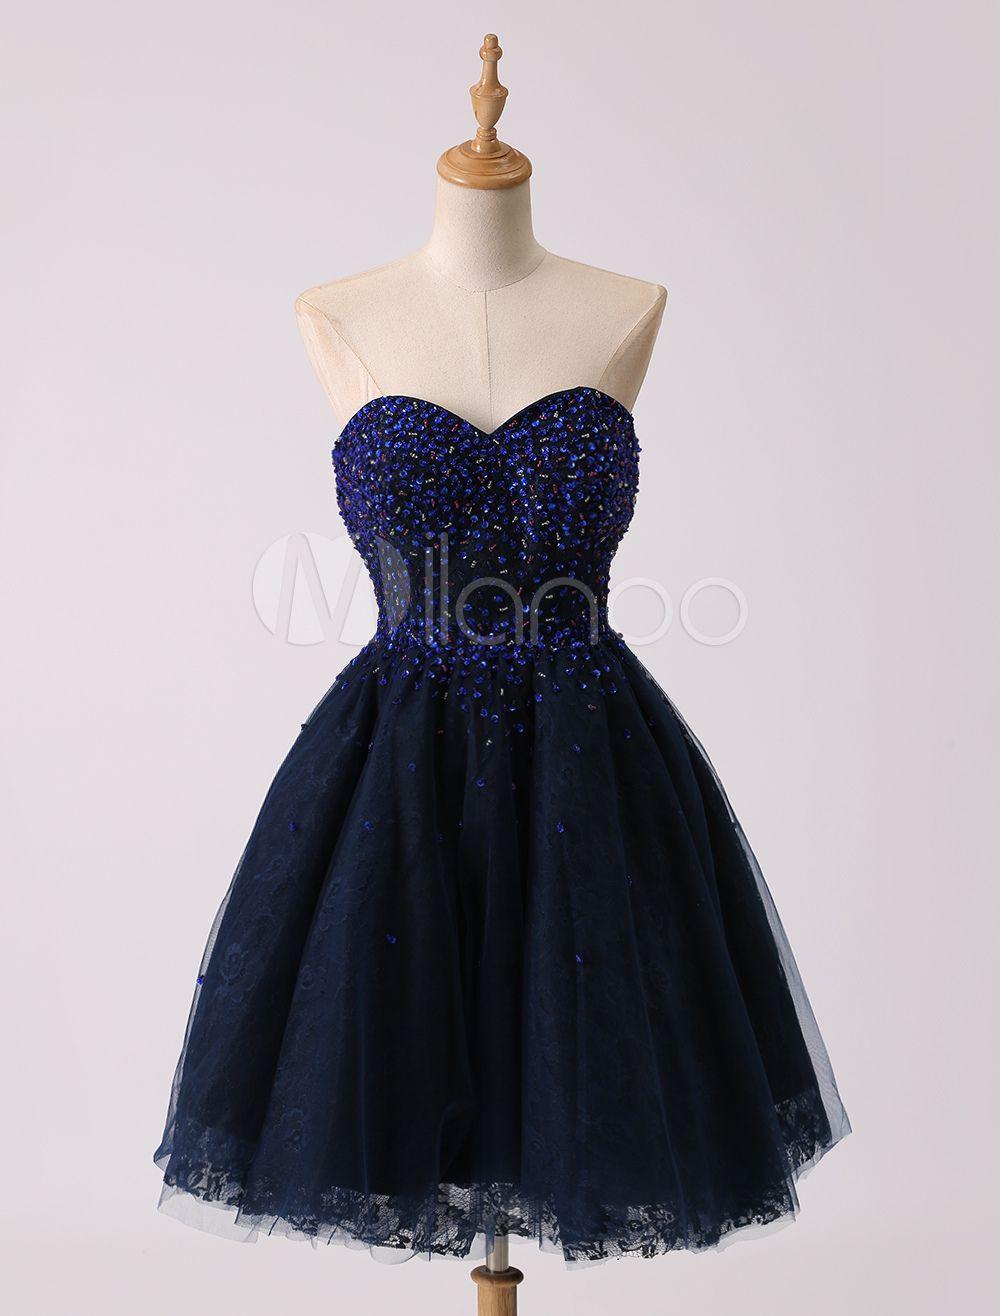 Prom-Kleid aus Tüll in Dunkelblau | kleider | Pinterest | Prom and ...